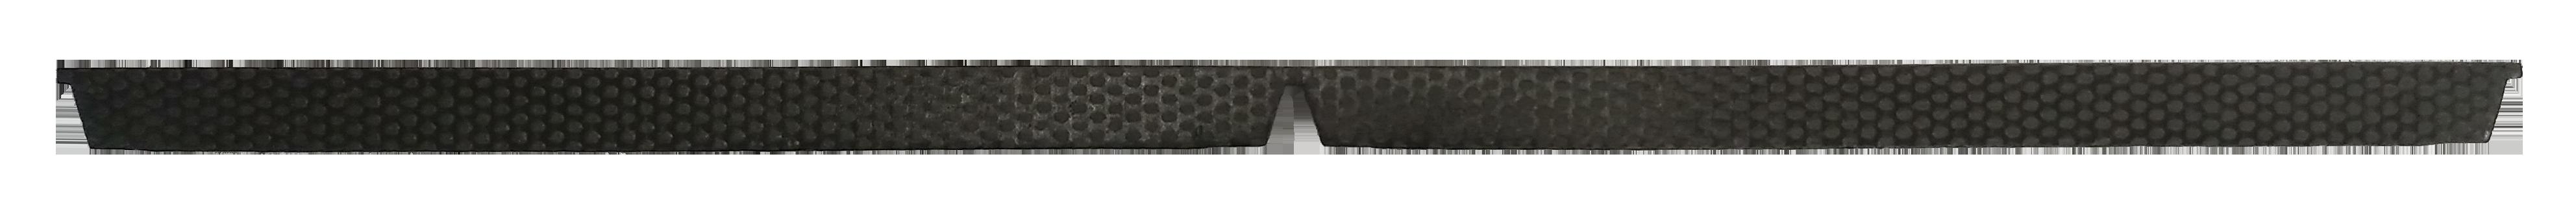 TC116 - SNAP-TITE 16'' CLOSURE